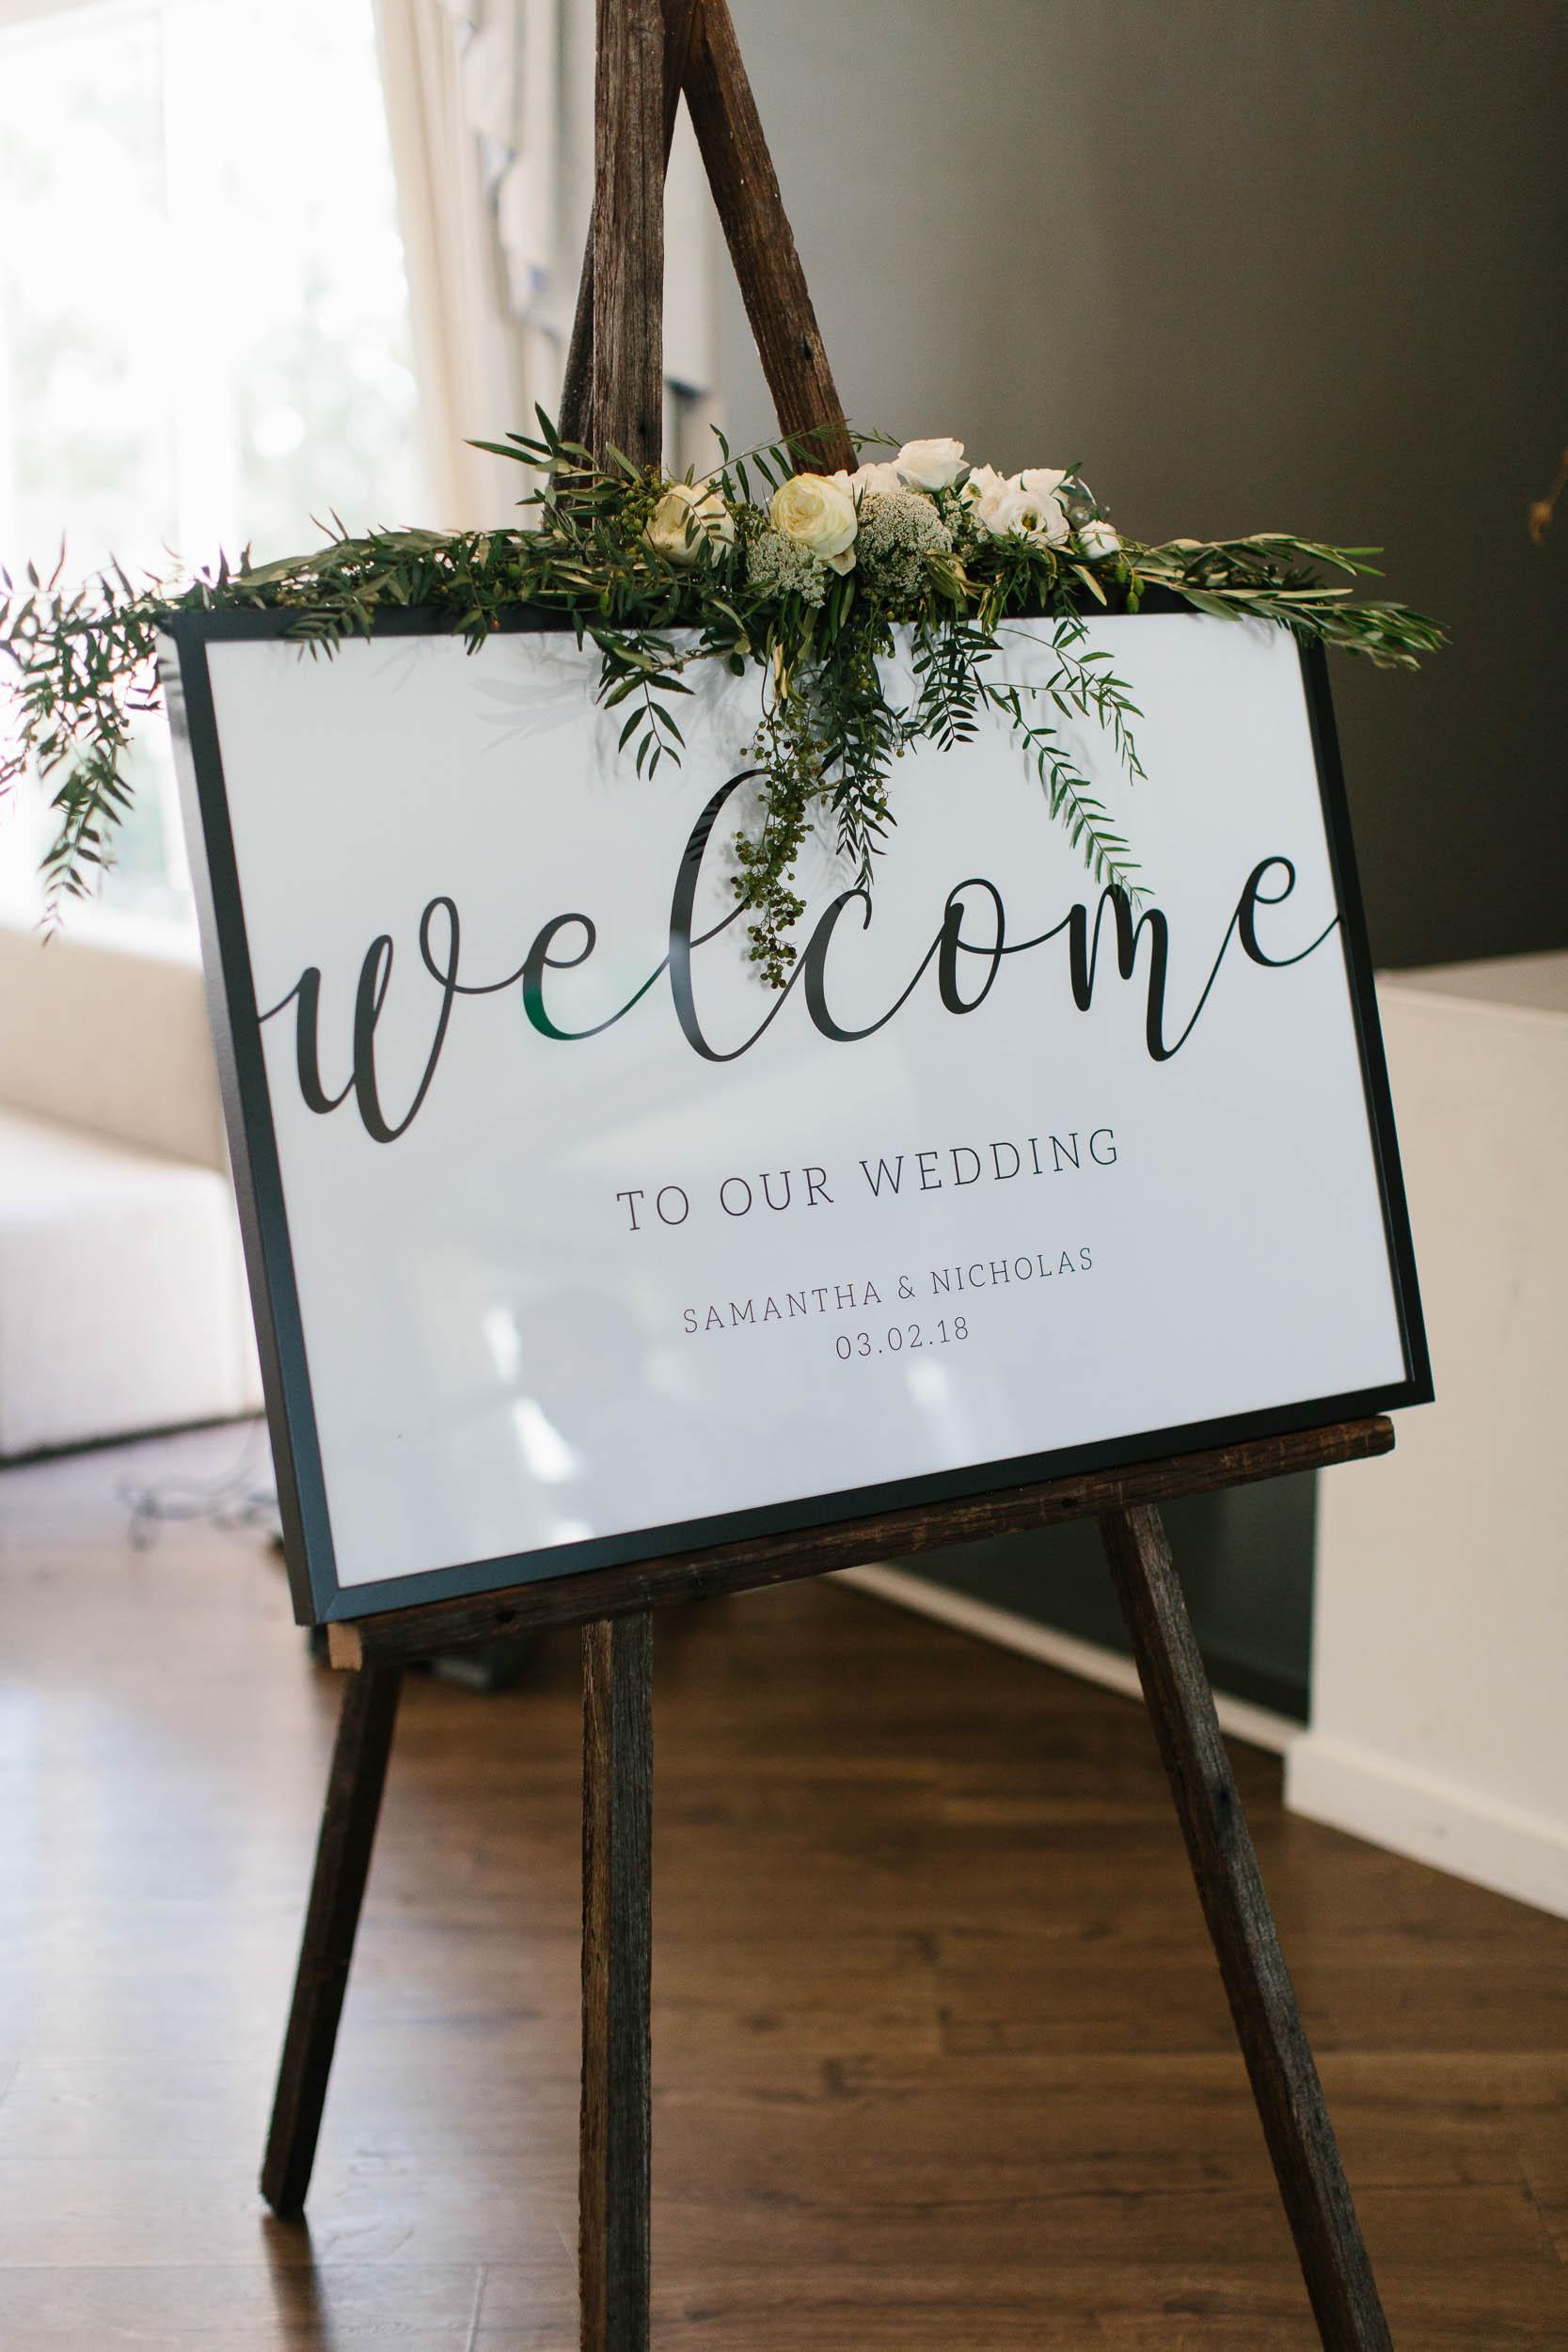 Kas-Richards-Mornington-Peninsula-Wedding-Lindenderry-Red-Hill-149.jpg